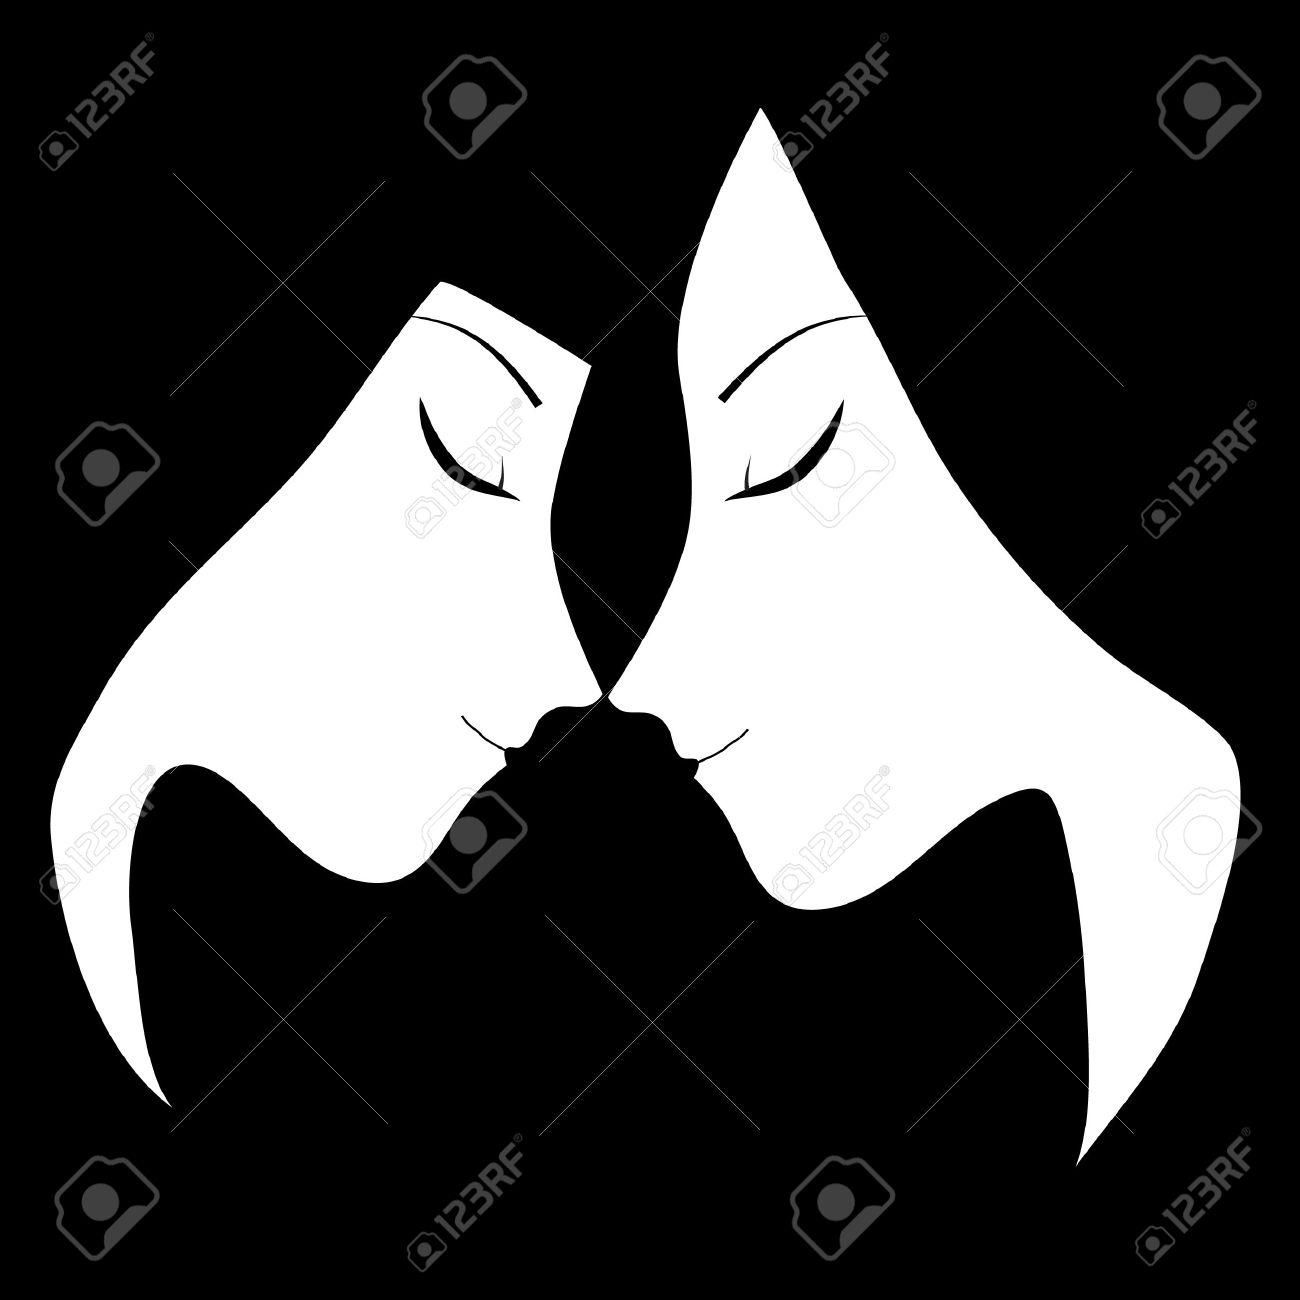 Black and white lesbian kiss